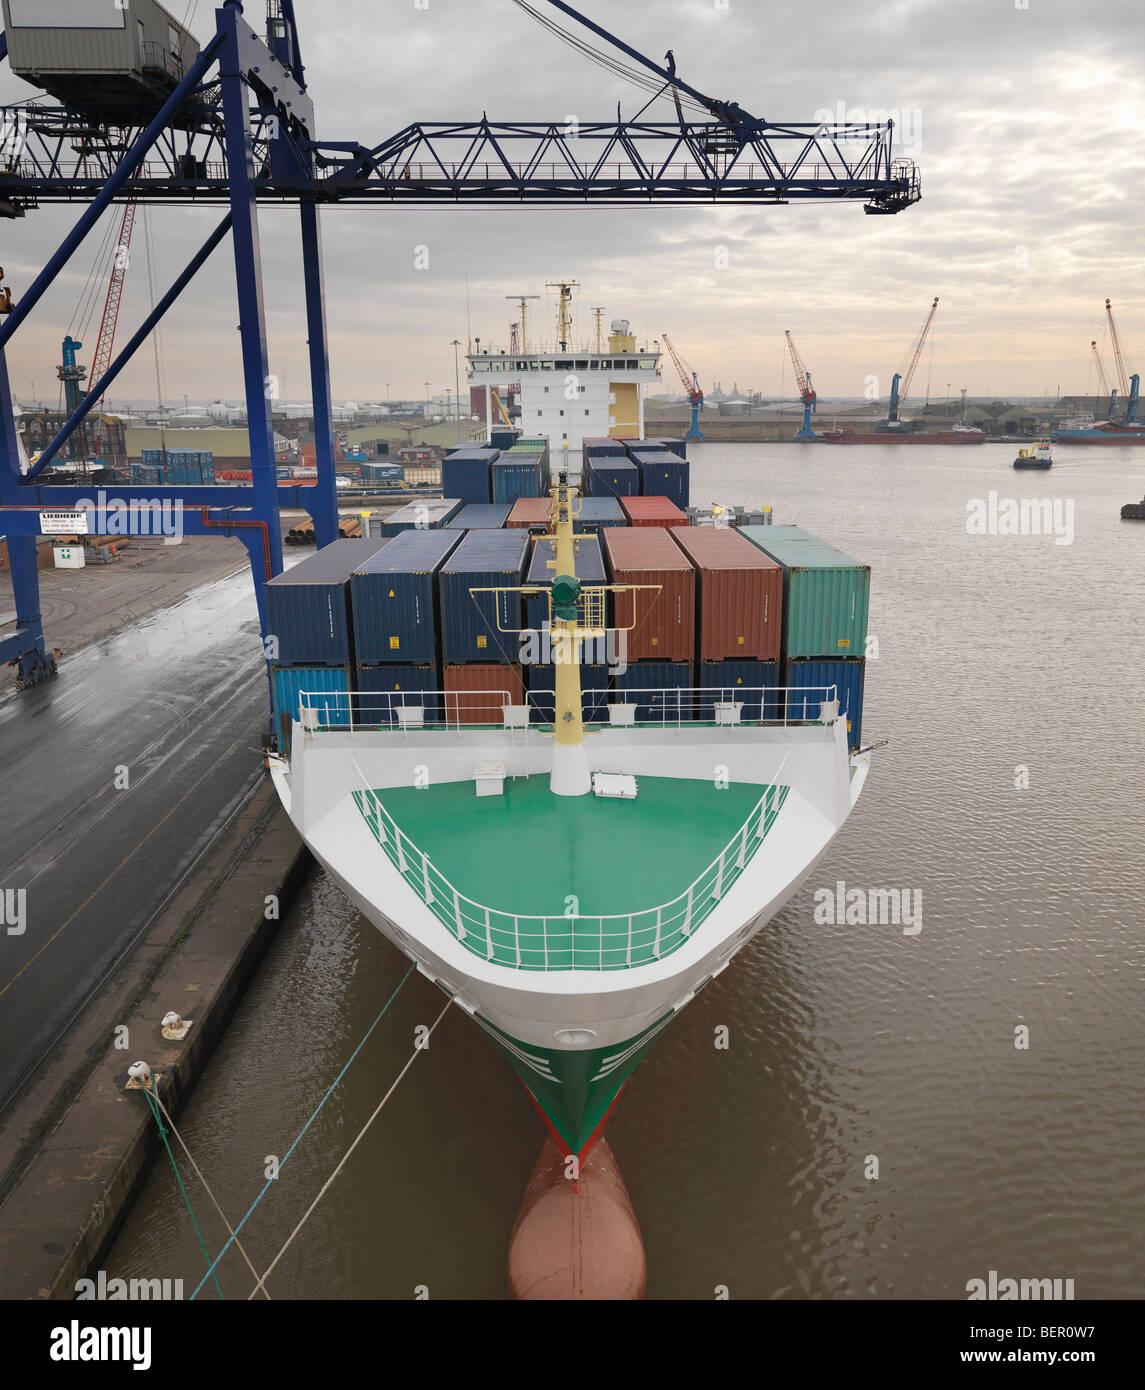 Barco de contenedores en el puerto Imagen De Stock